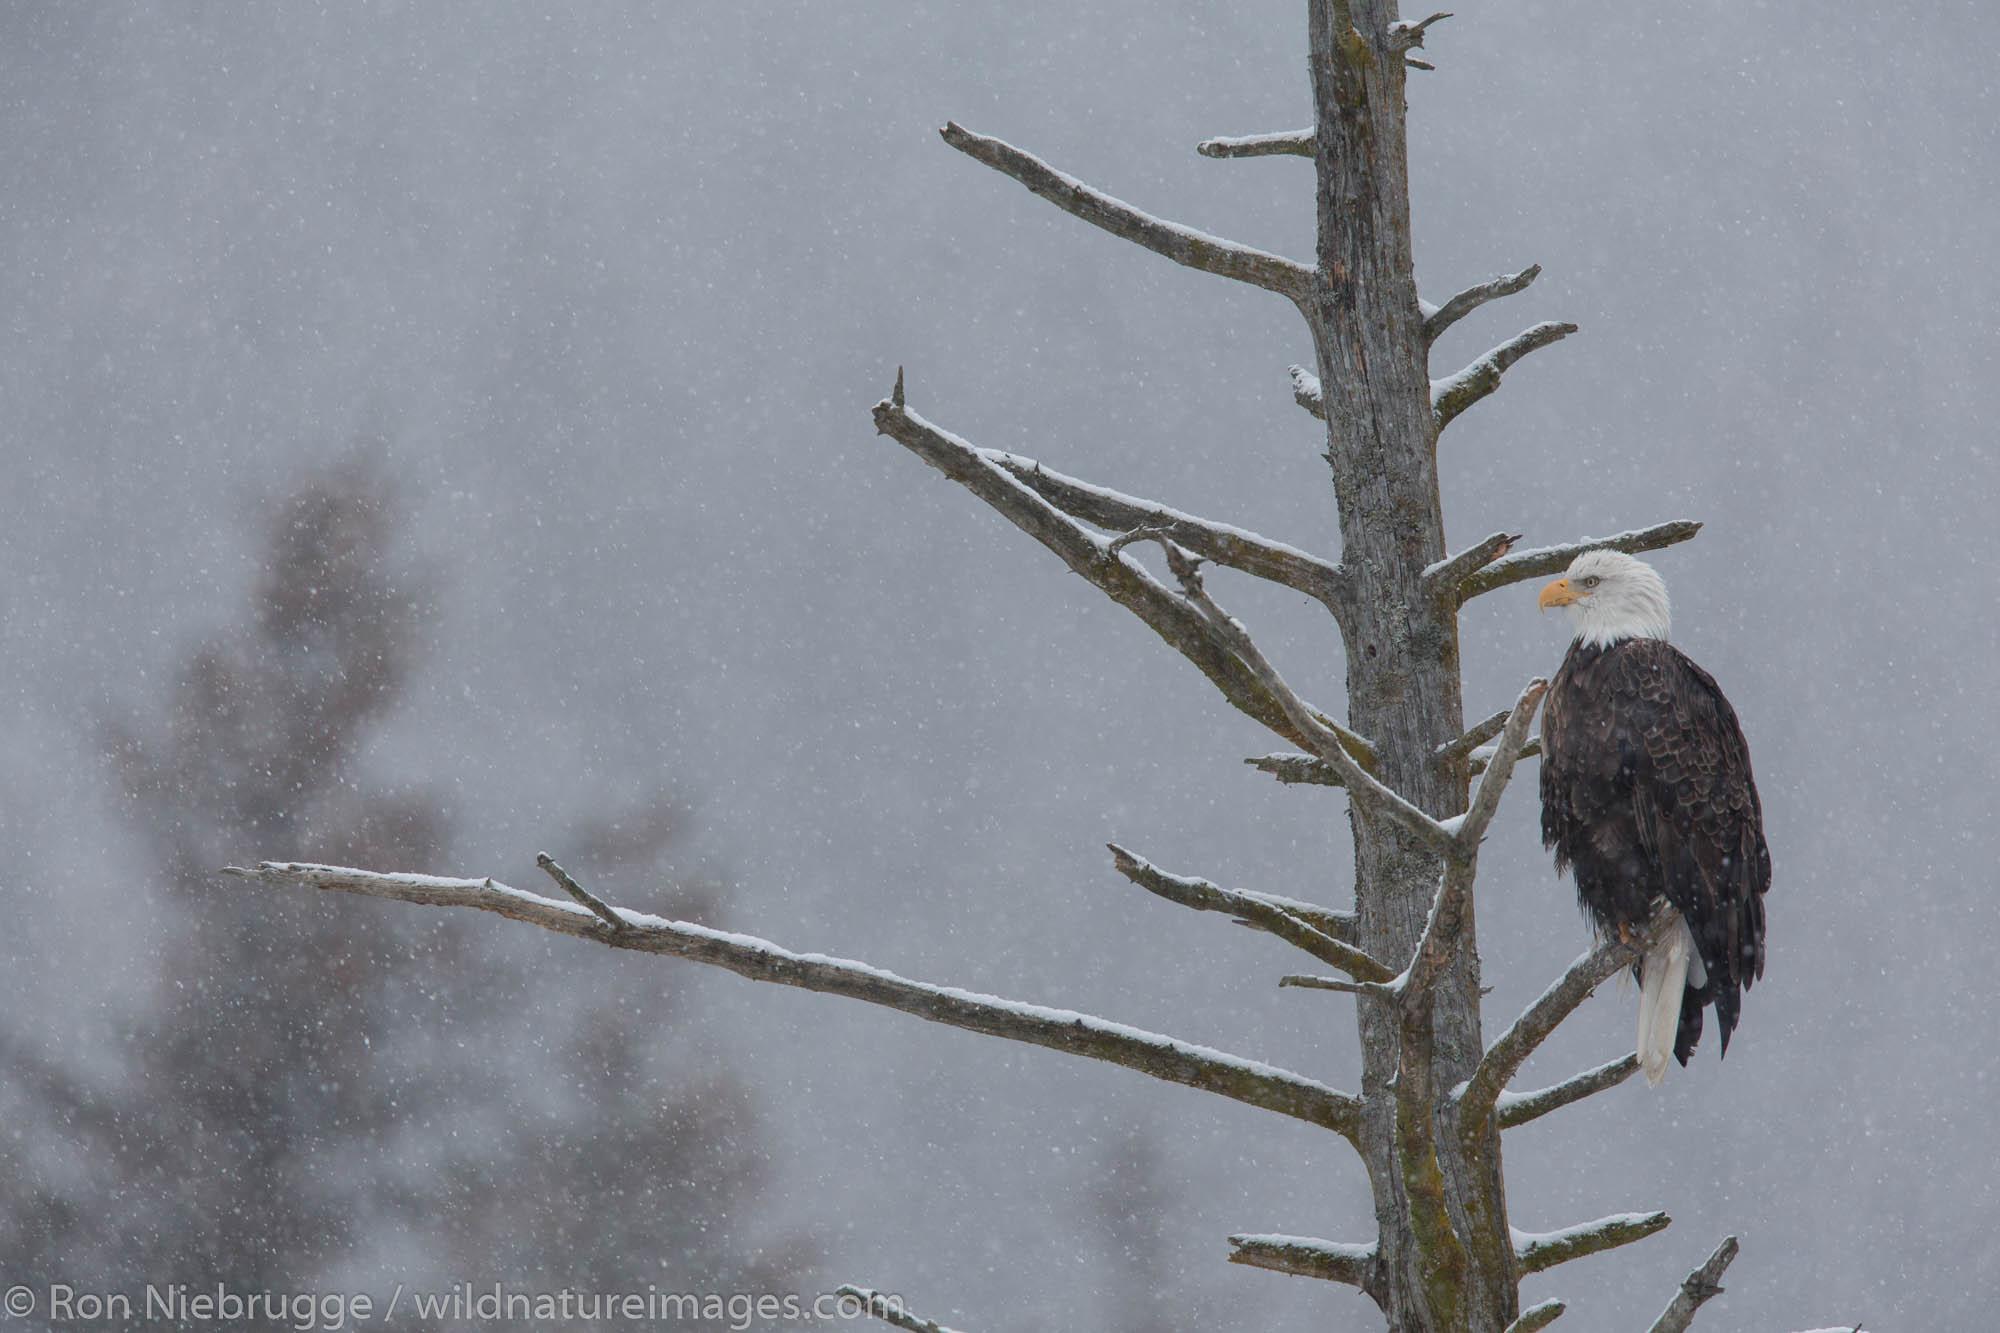 Bald eagle, Resurrection Bay, Seward, Alaska.